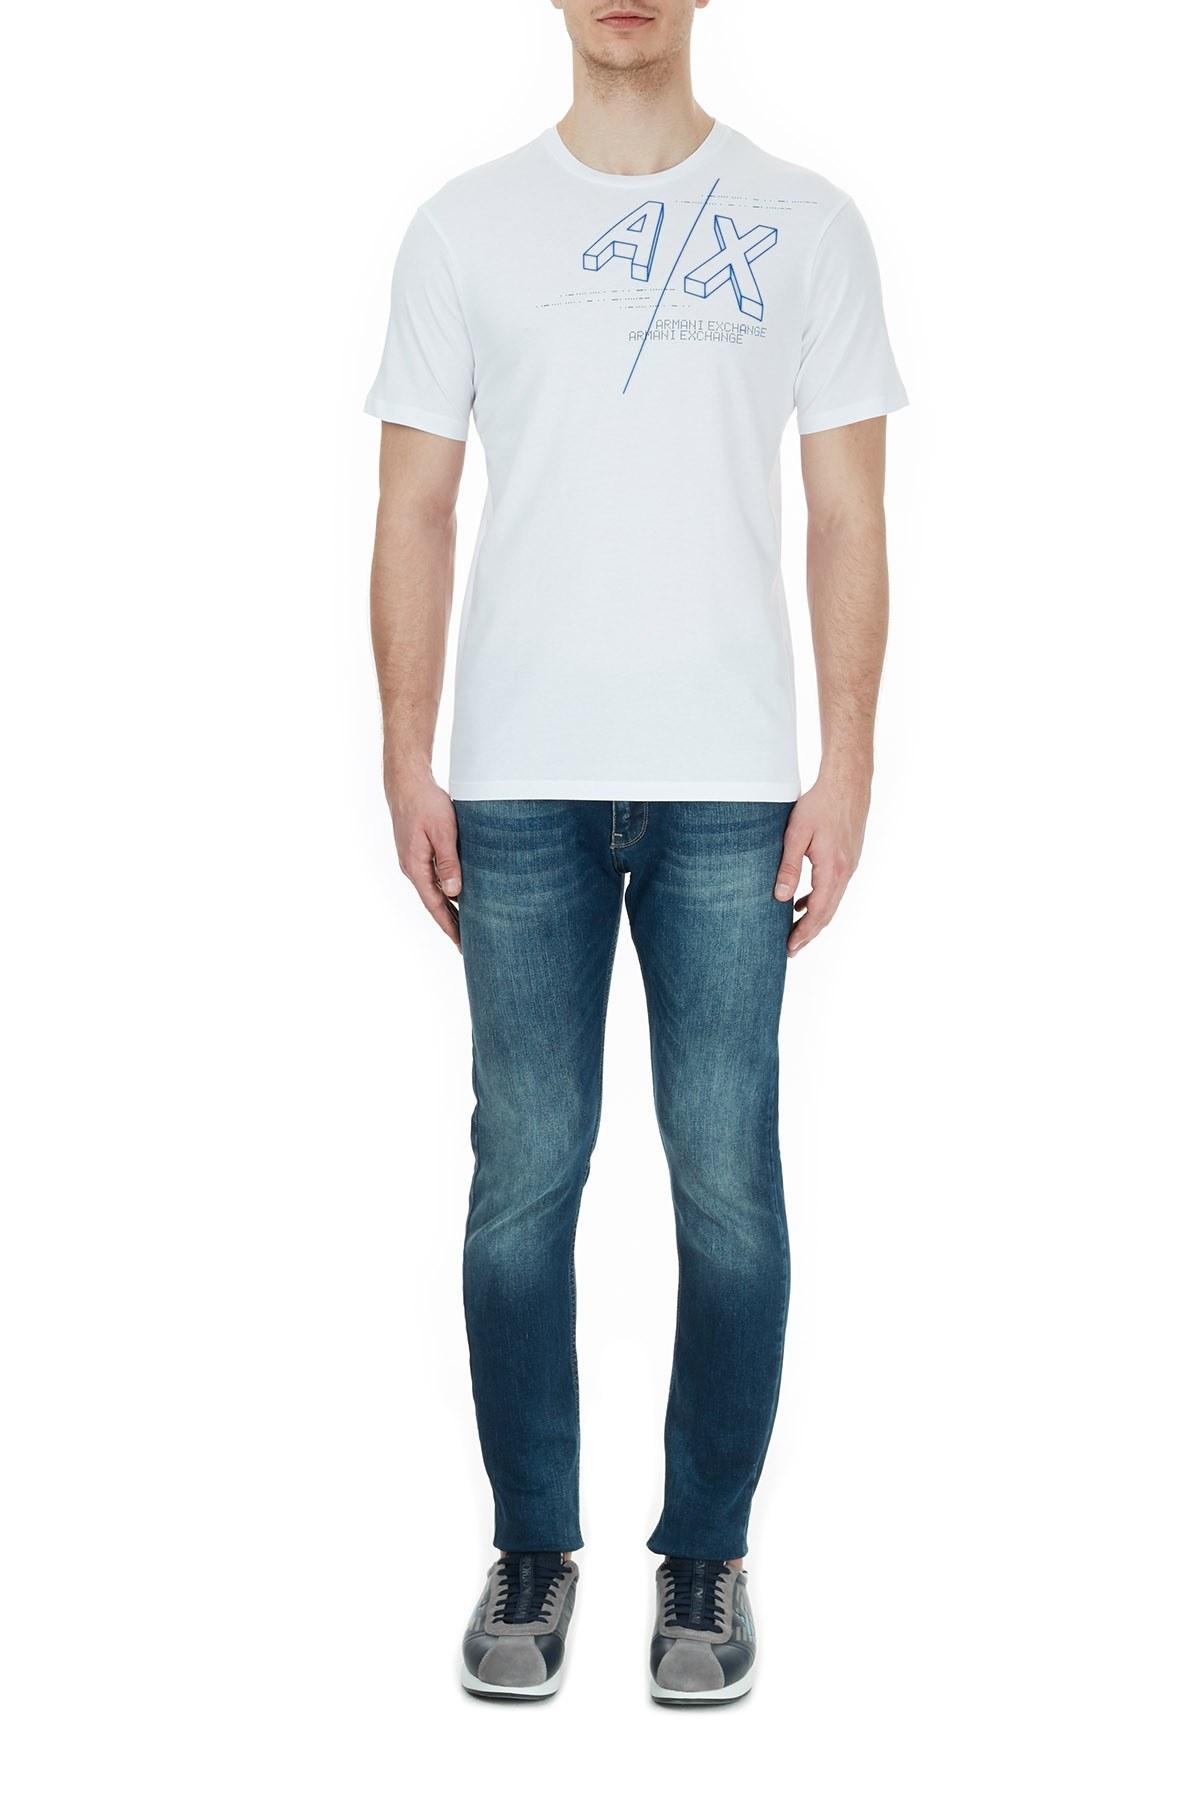 Armani Exchange % 100 Pamuklu Baskılı Bisiklet Yaka Erkek T Shirt 6HZTFA ZJBVZ 1100 BEYAZ